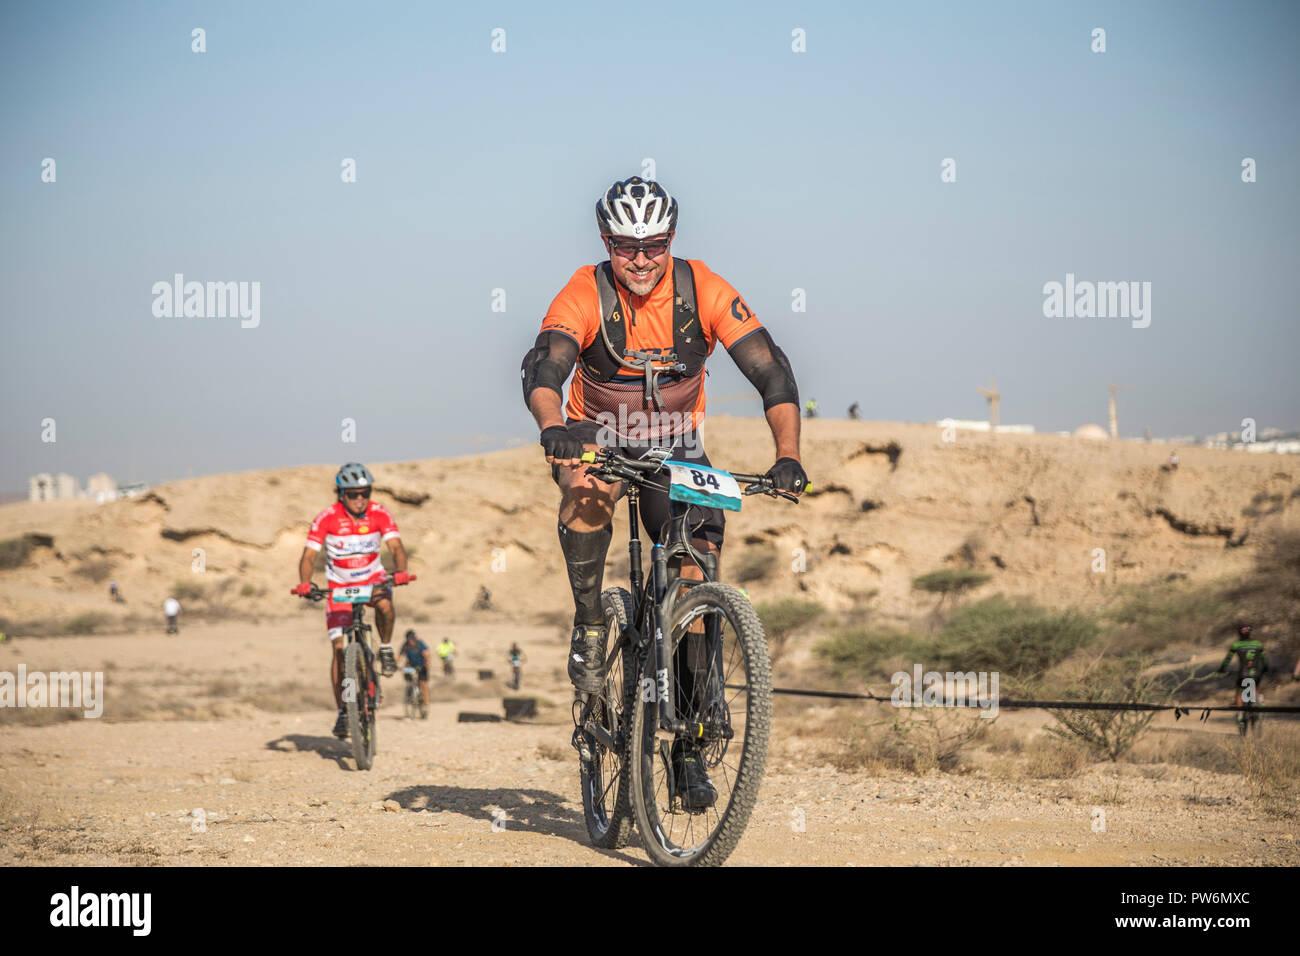 Mountain Bike  Race, Cross country, The start. Muscat, Oman - Stock Image